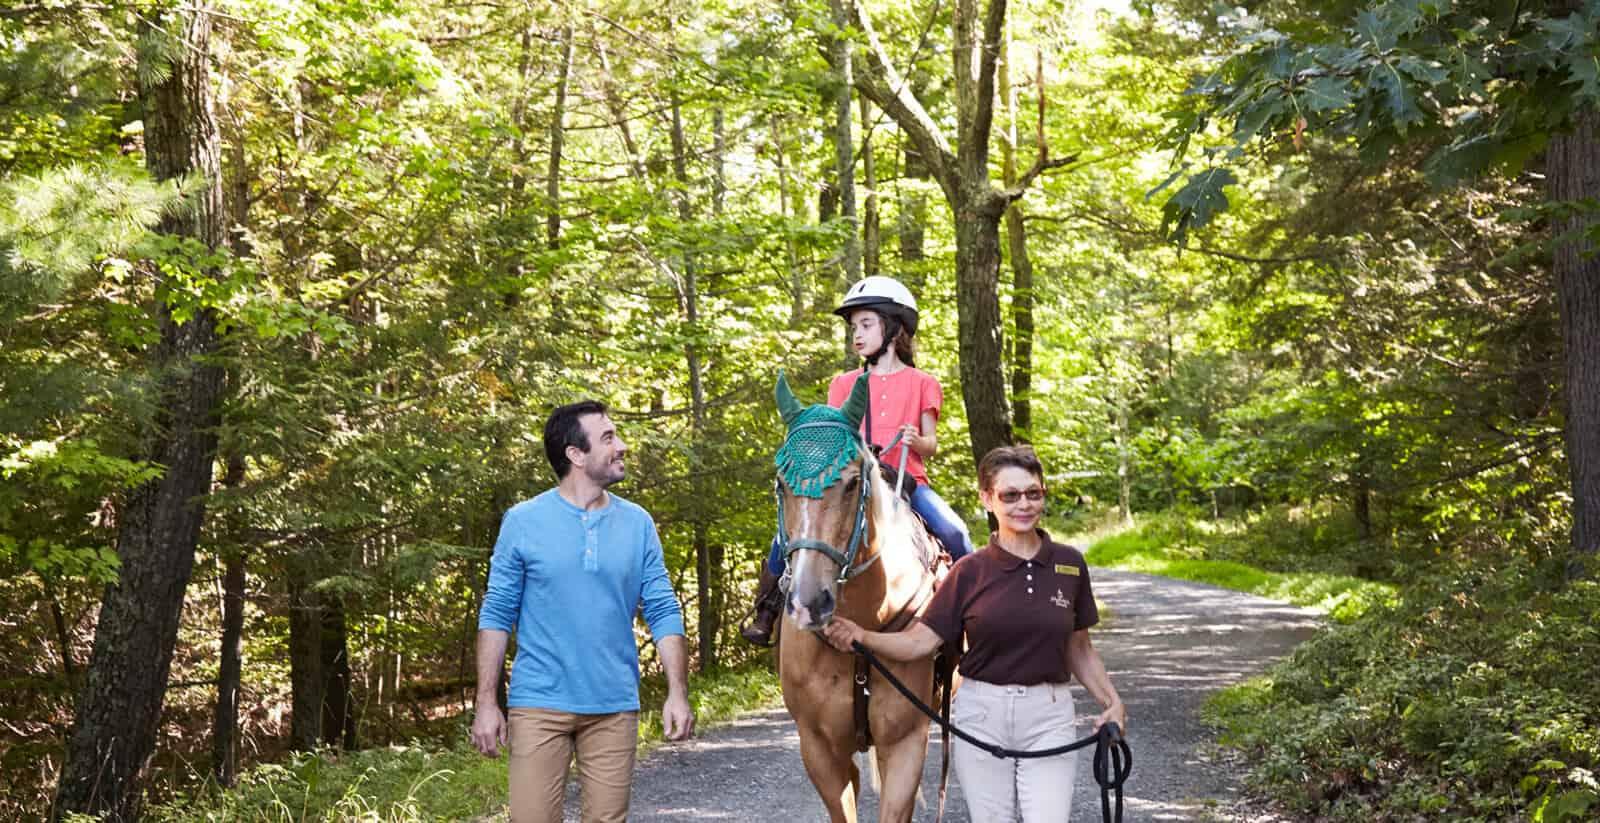 Horseback Riding - Outdoor Activities - Hudson Valley - Mohonk